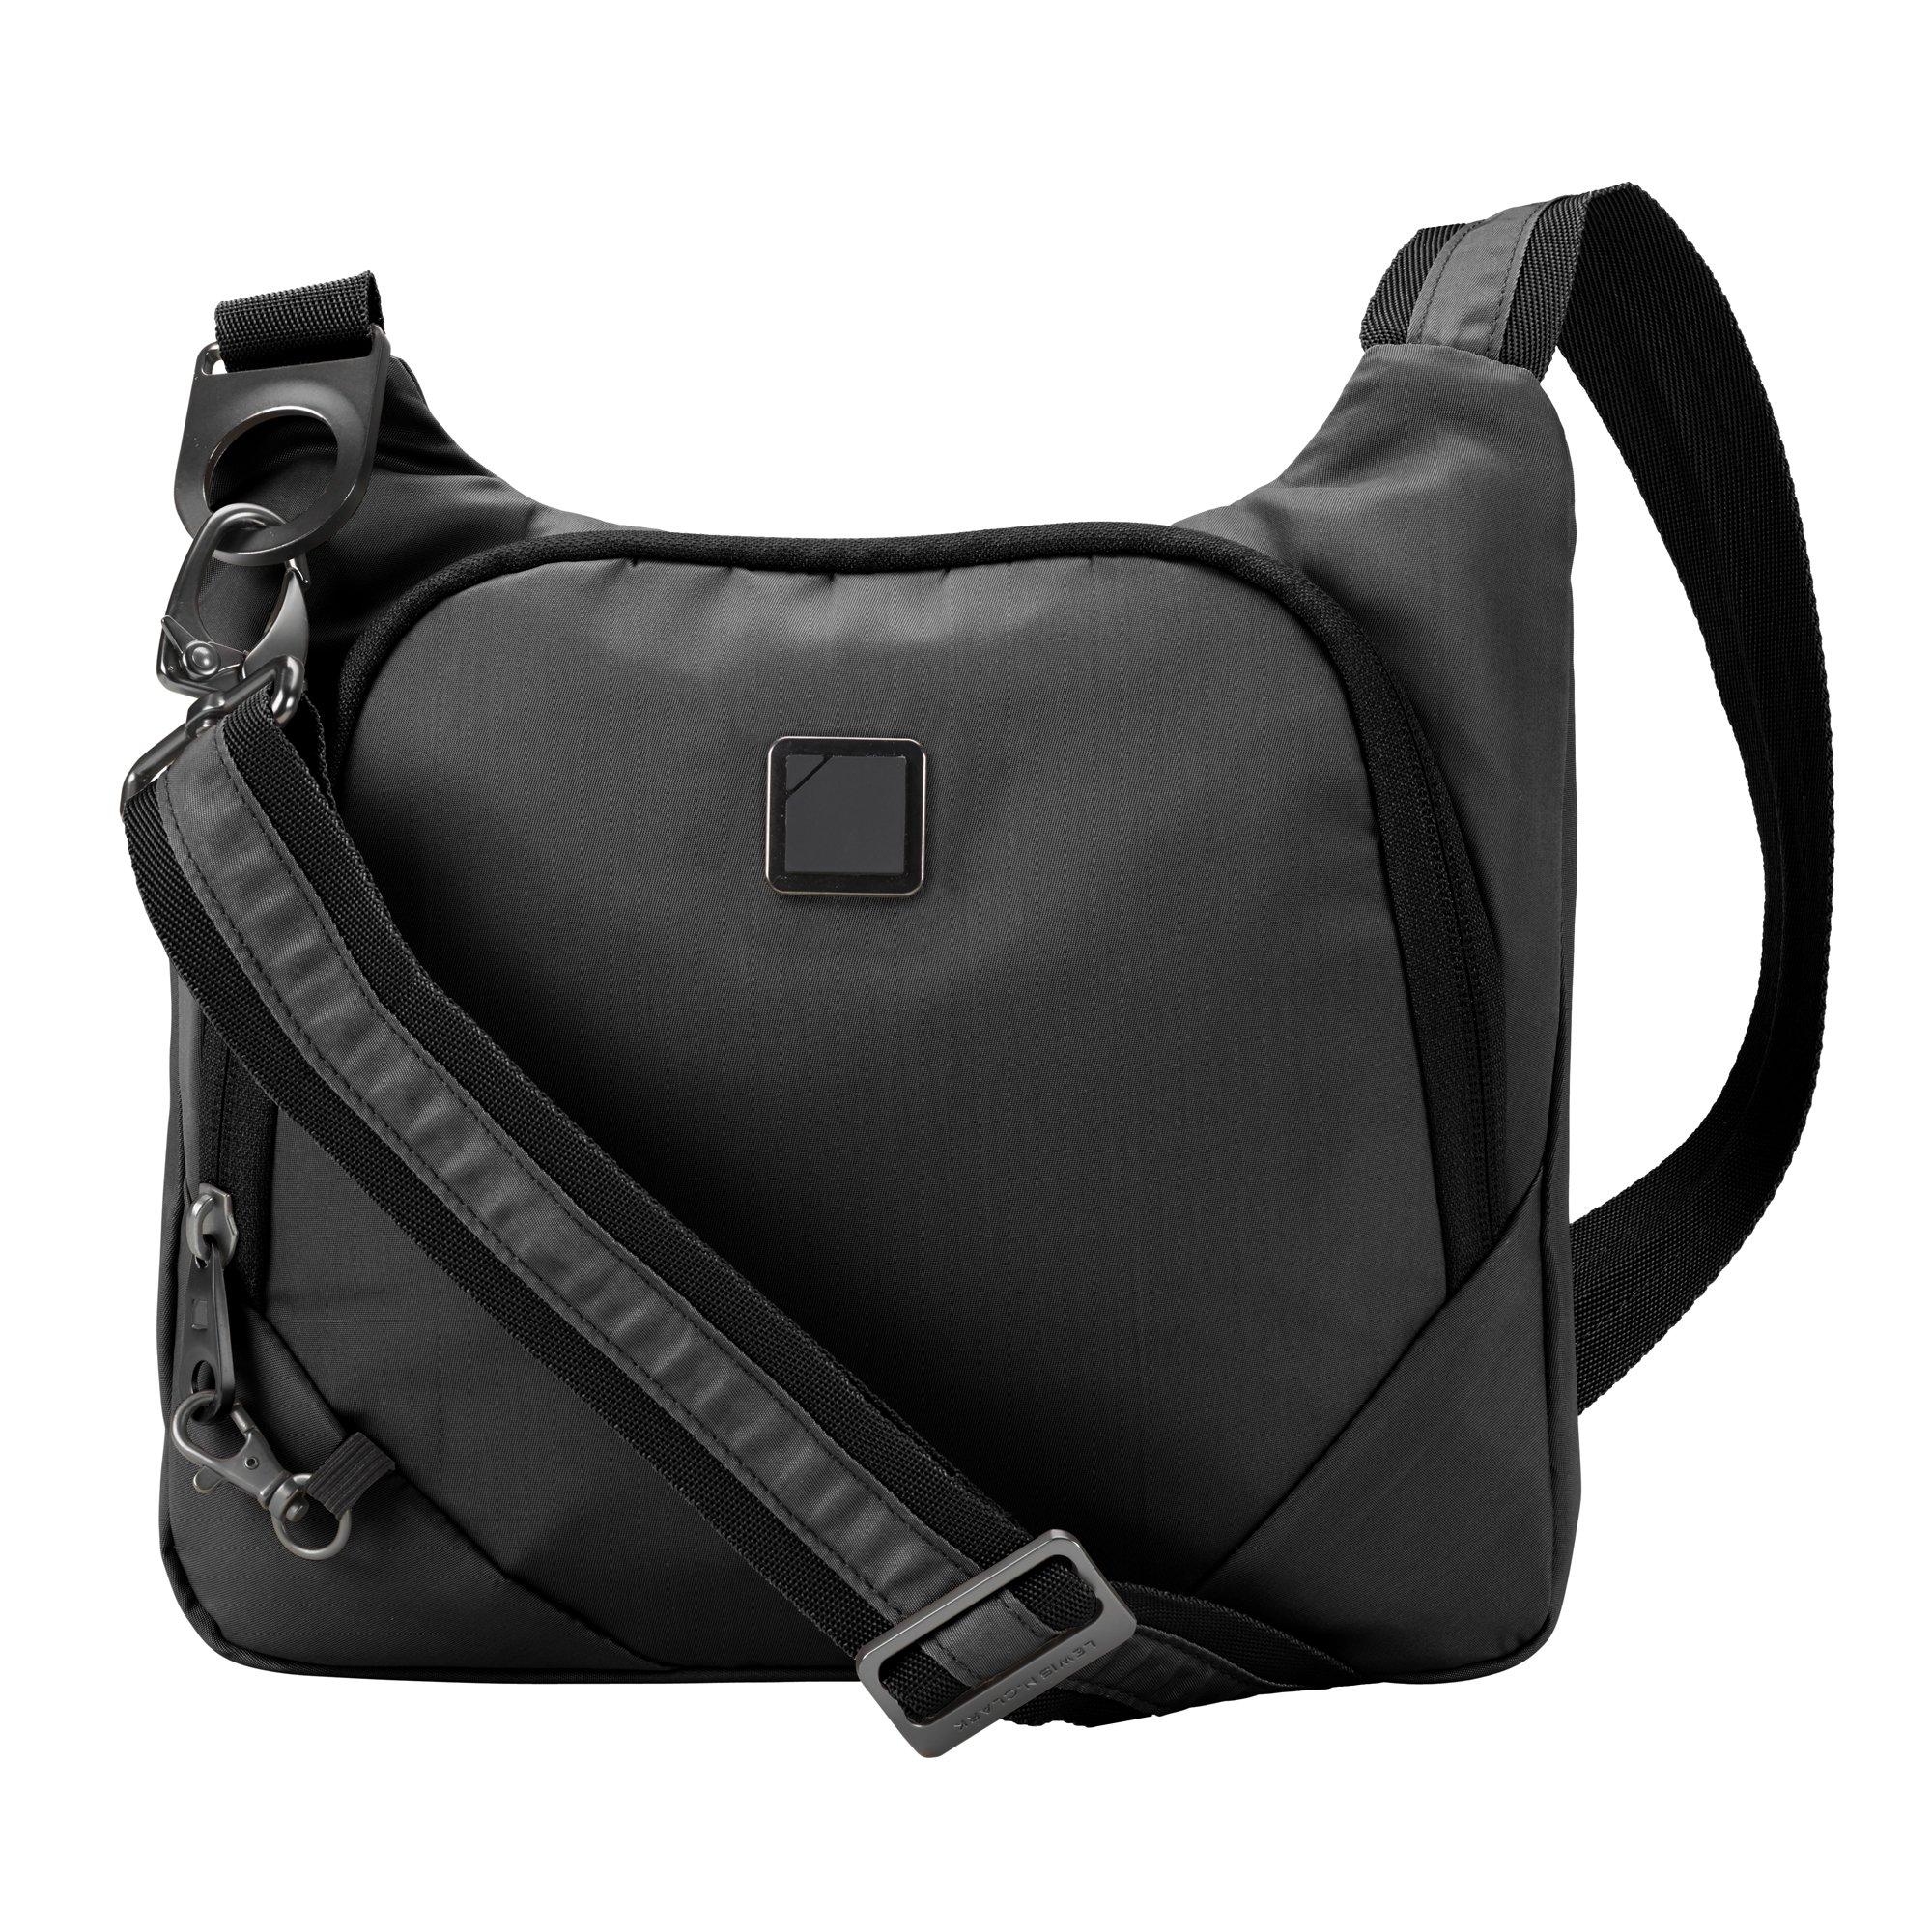 Lewis N. Clark Secura Anti-theft Cross Body Bag, Onyx